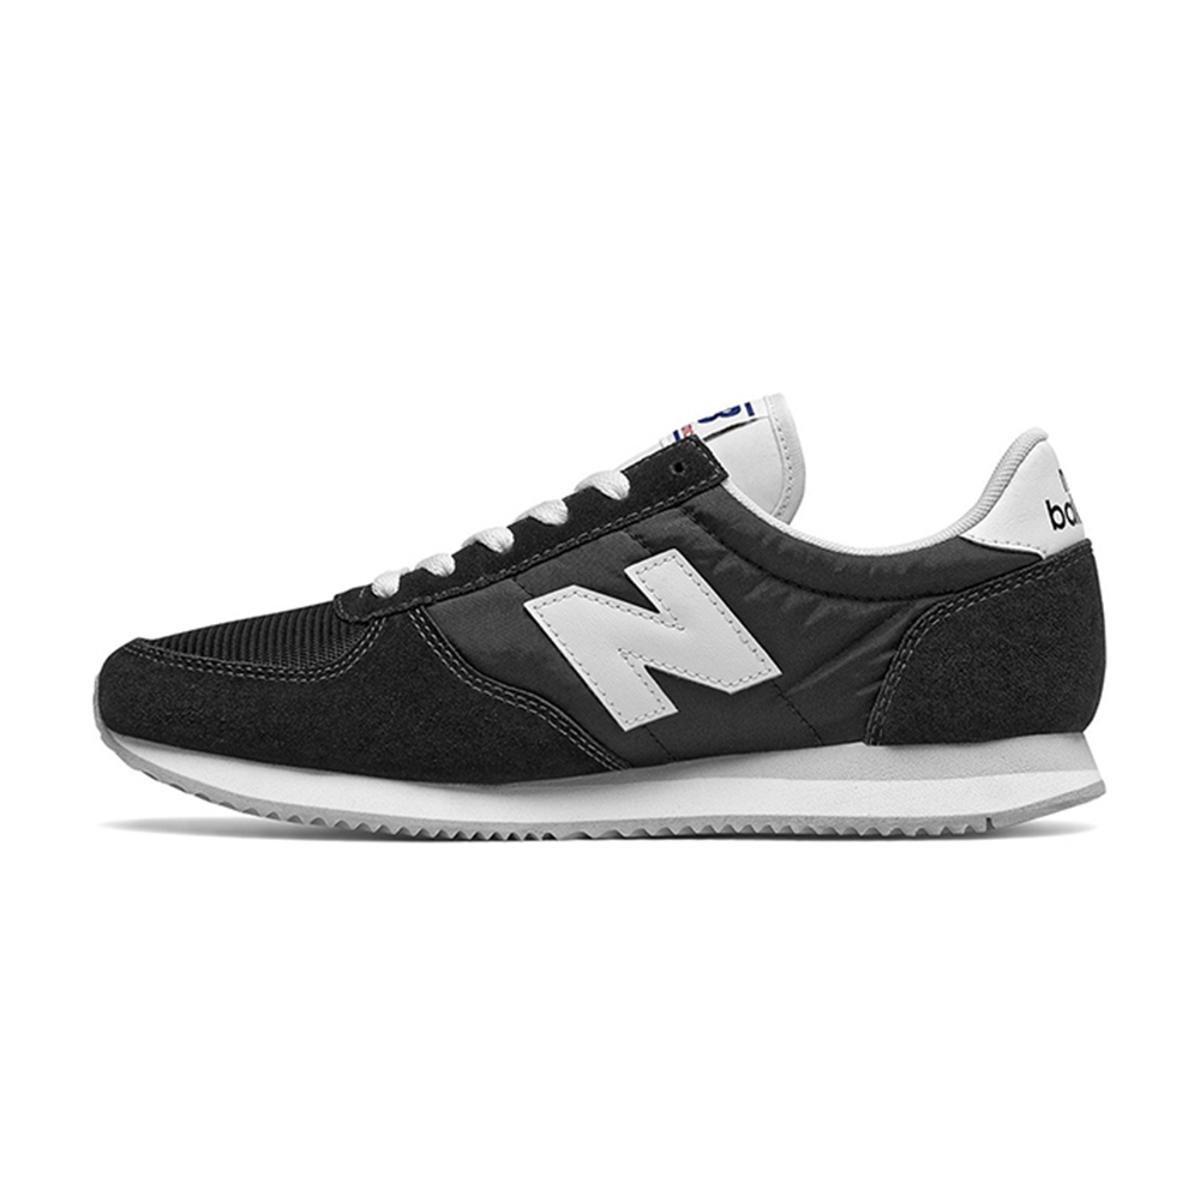 Tênis New Balance 220 Masculino - Compre Agora  fce6f06214934